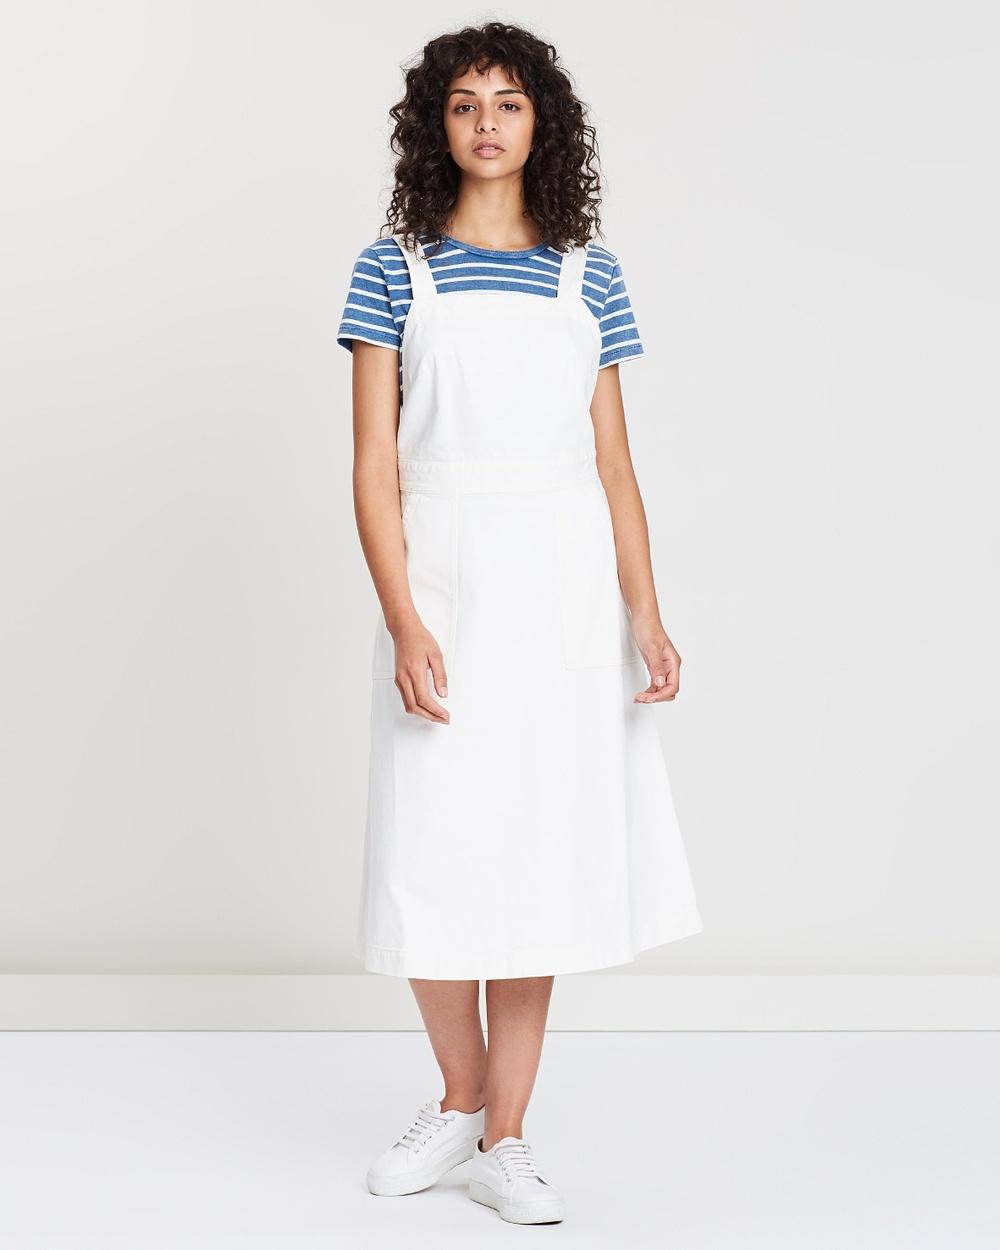 Polo Ralph Lauren White Denim Apron Sleeveless Dress